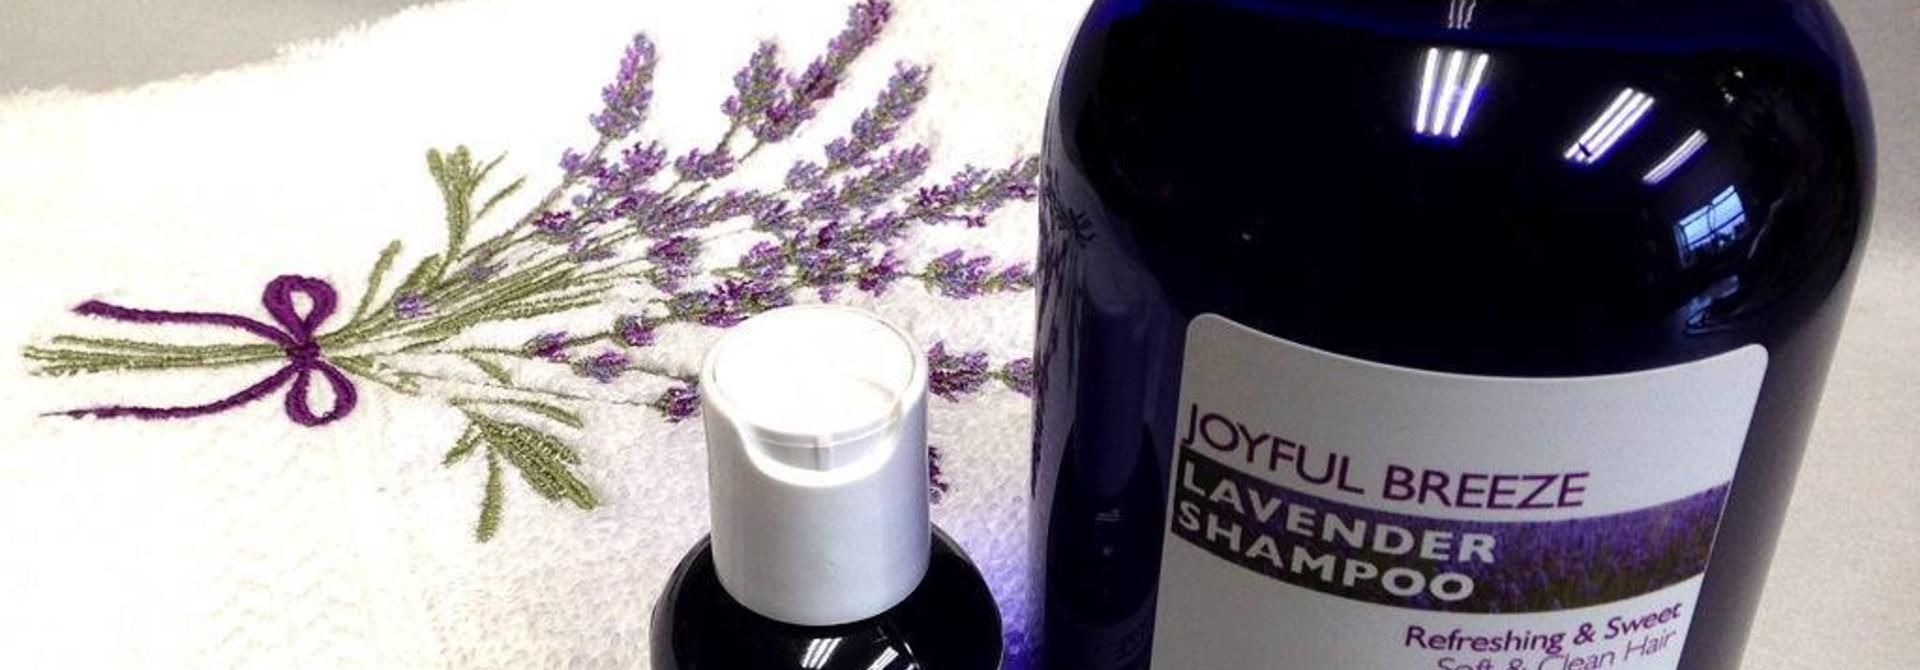 Joyful Breeze Lavender Shampoo - 2oz